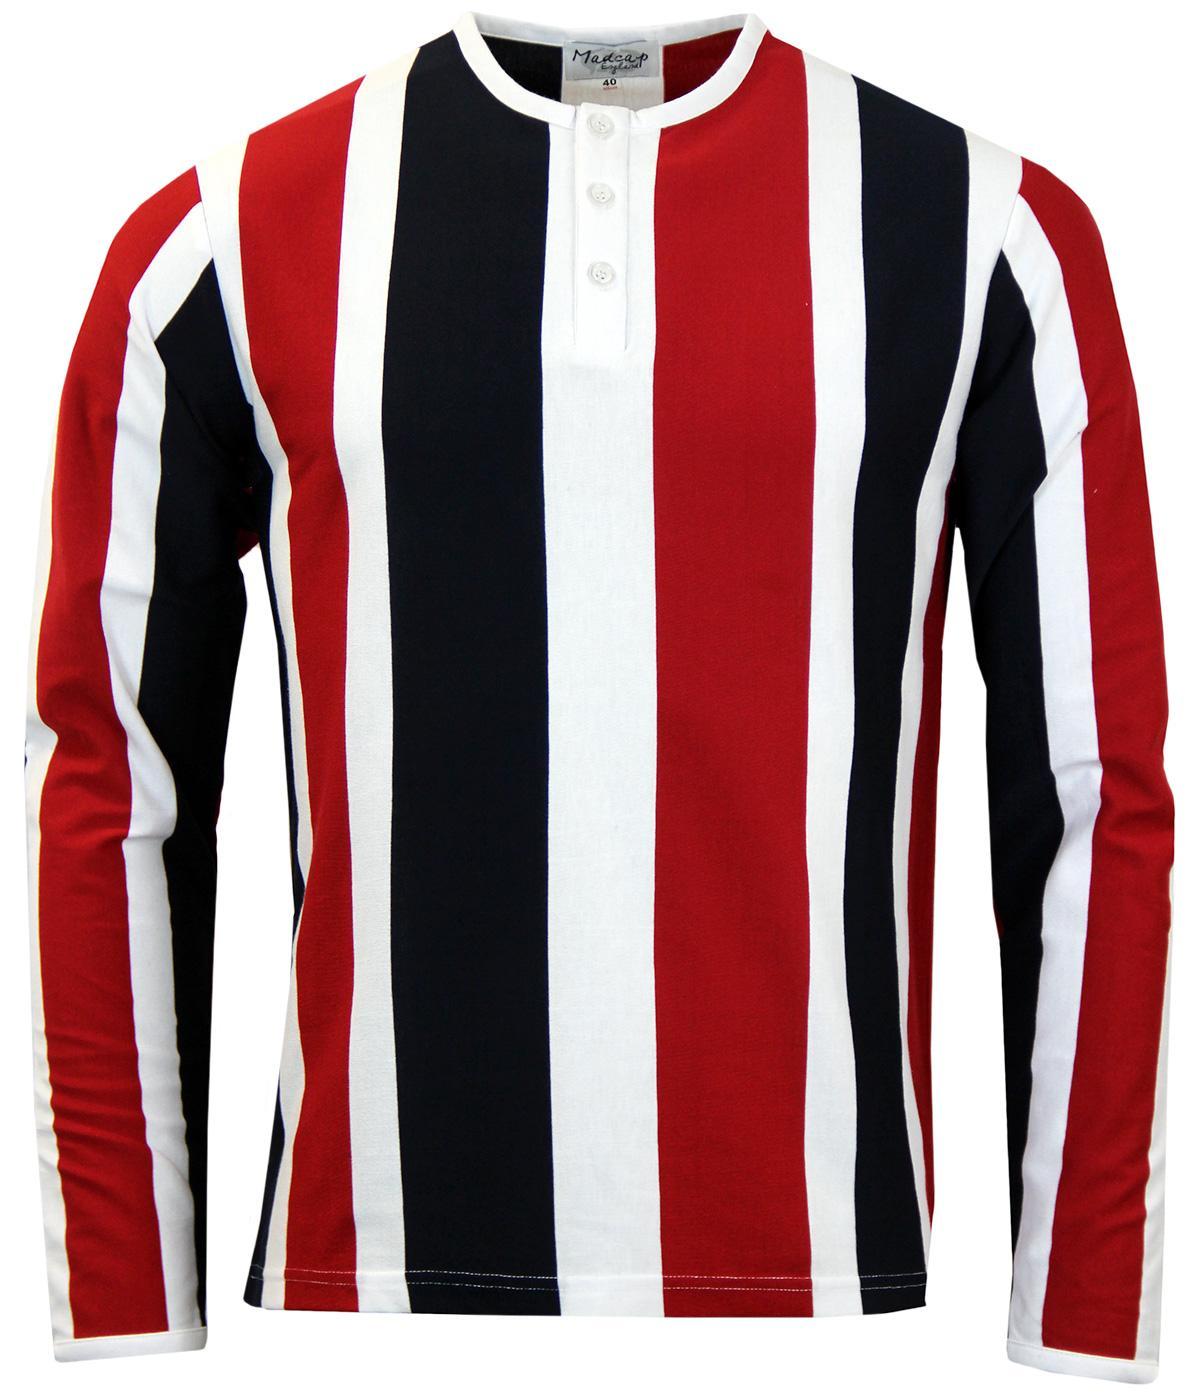 Winston L/S MADCAP ENGLAND Mod Stripe Grandad Top